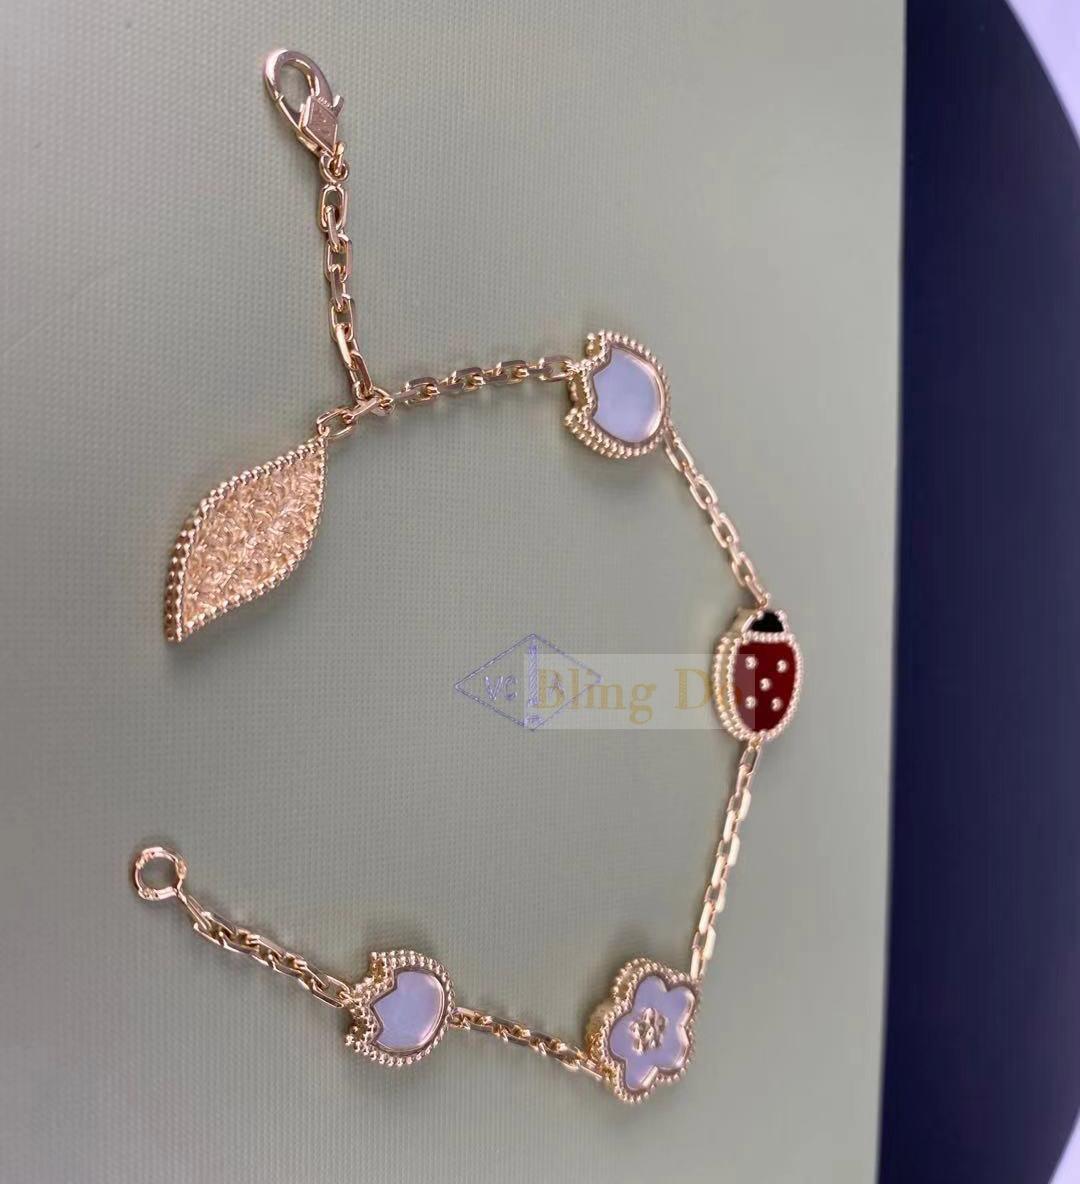 VCA Lucky Spring 18K Rose Gold with 5 Motifs Carnelian, Mother-of-pearl, Onyx bracelet